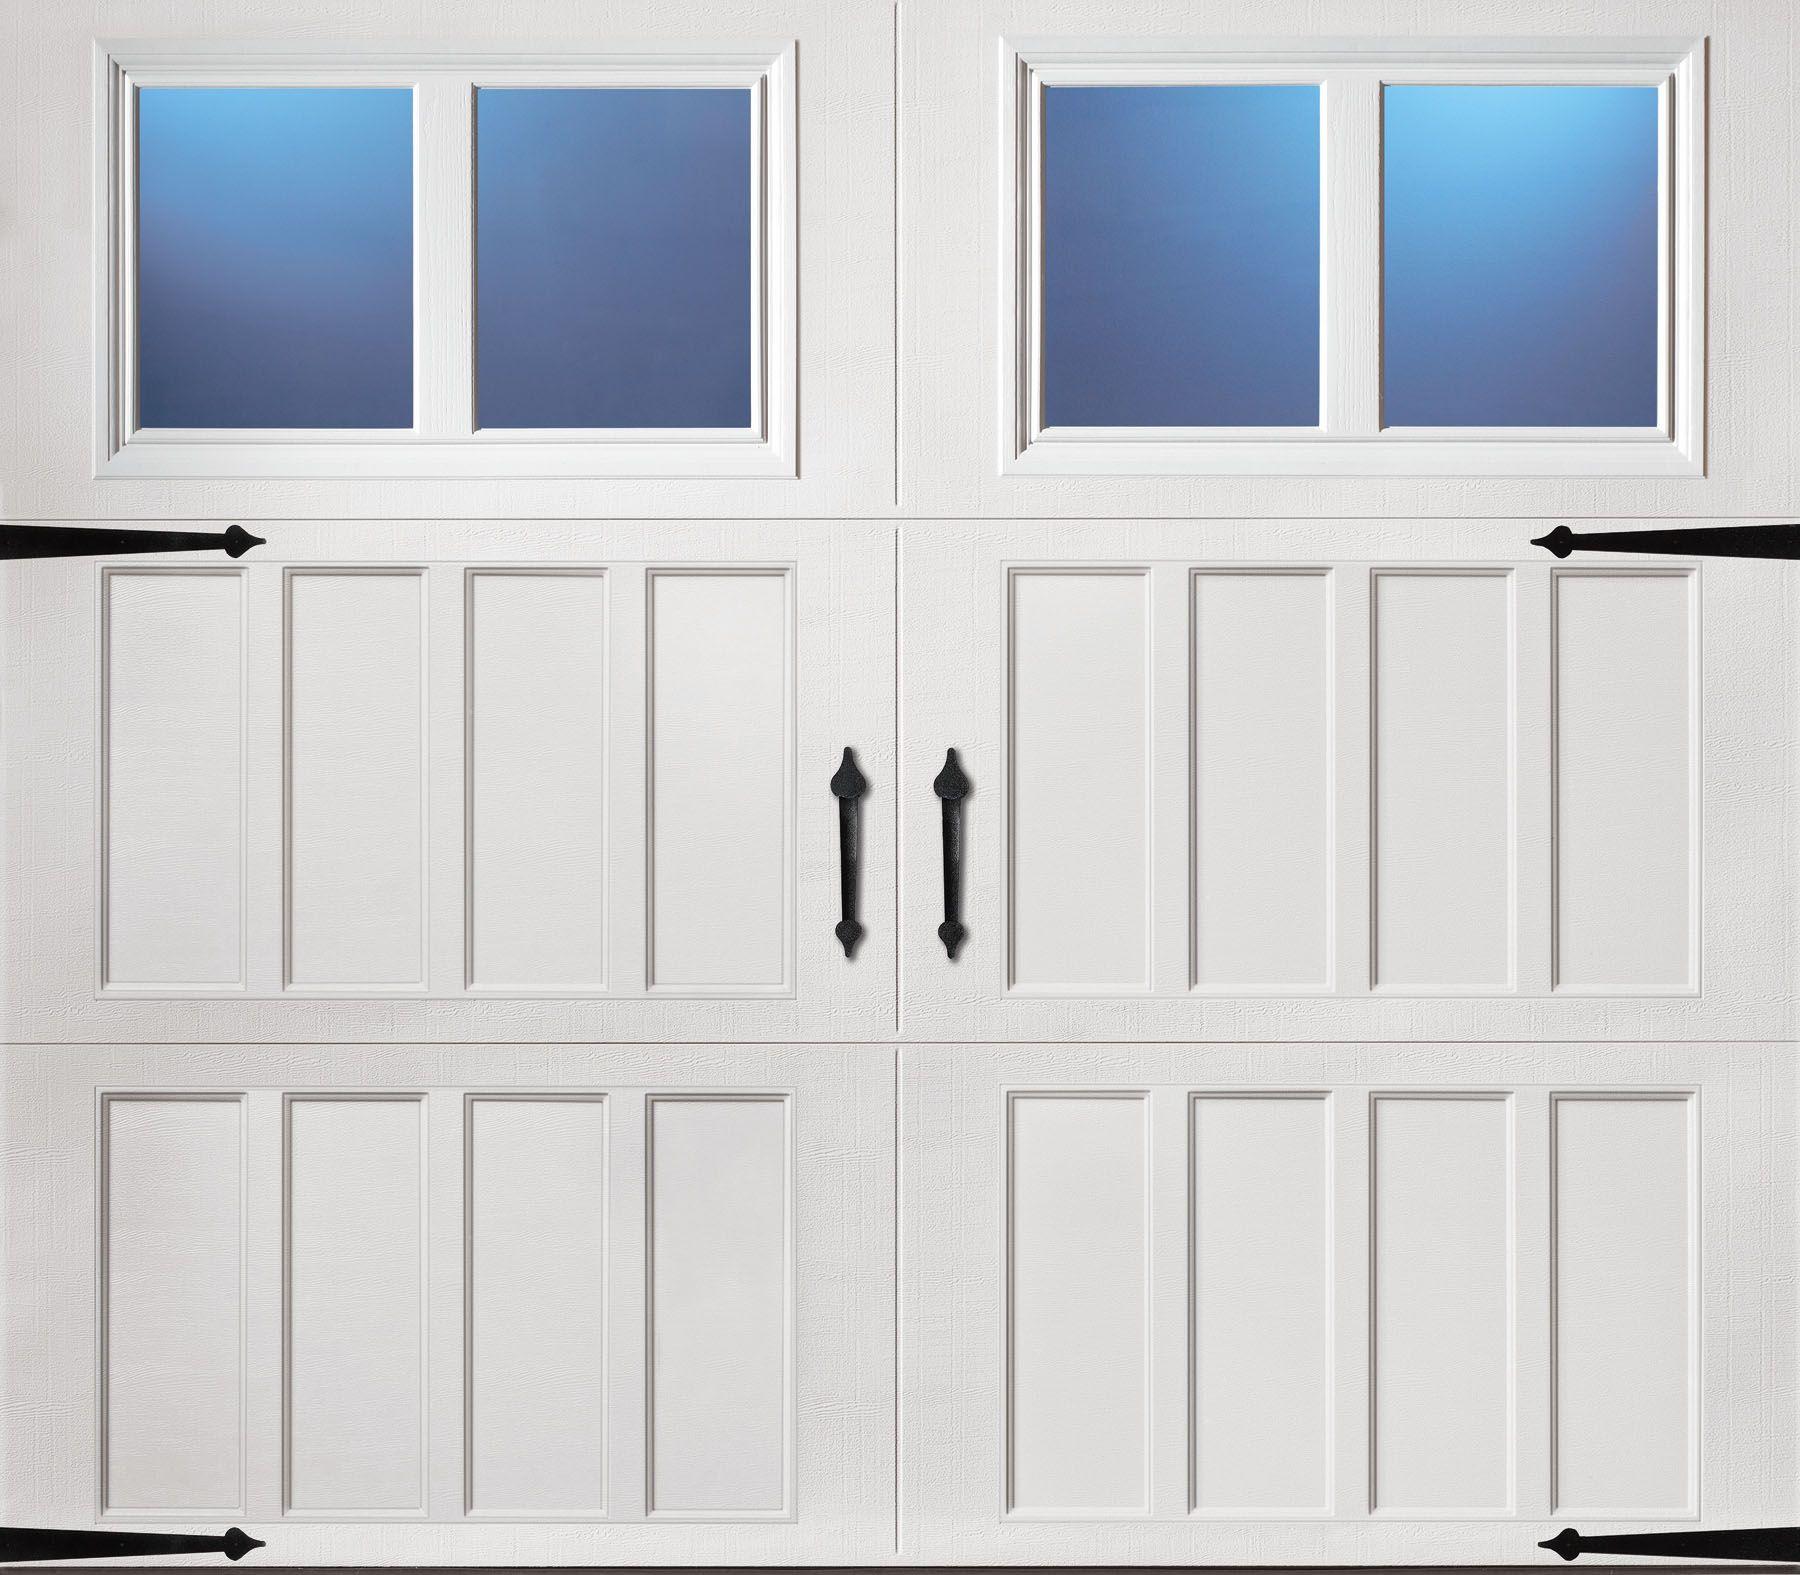 Classica northampton garage door white 9 x 8 no windows - Classica Northampton Garage Door White 9 X 8 No Windows 45